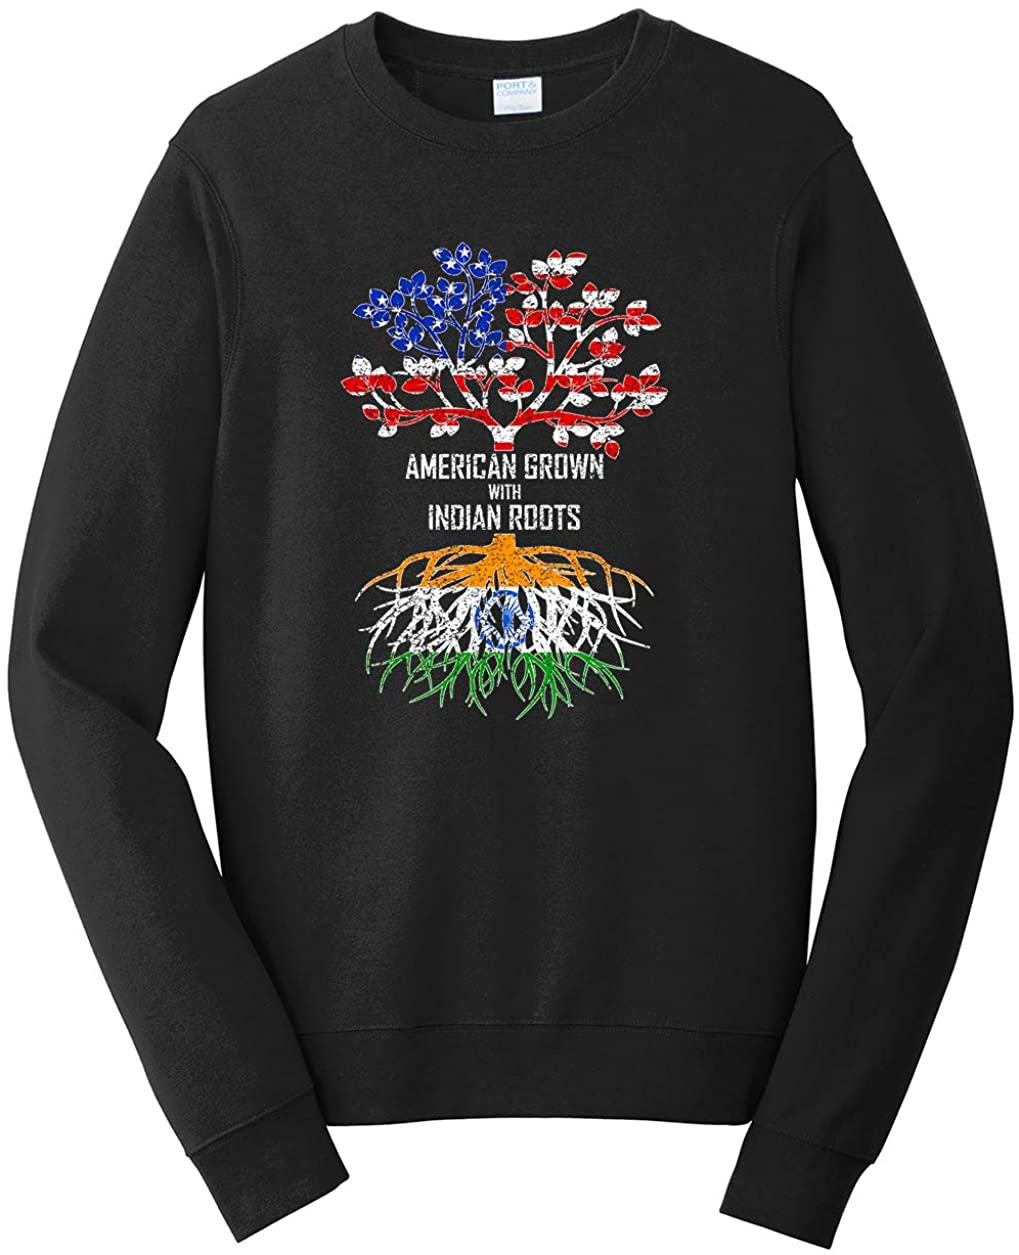 Tenacitee Unisex American Grown with Indian Roots Sweatshirt